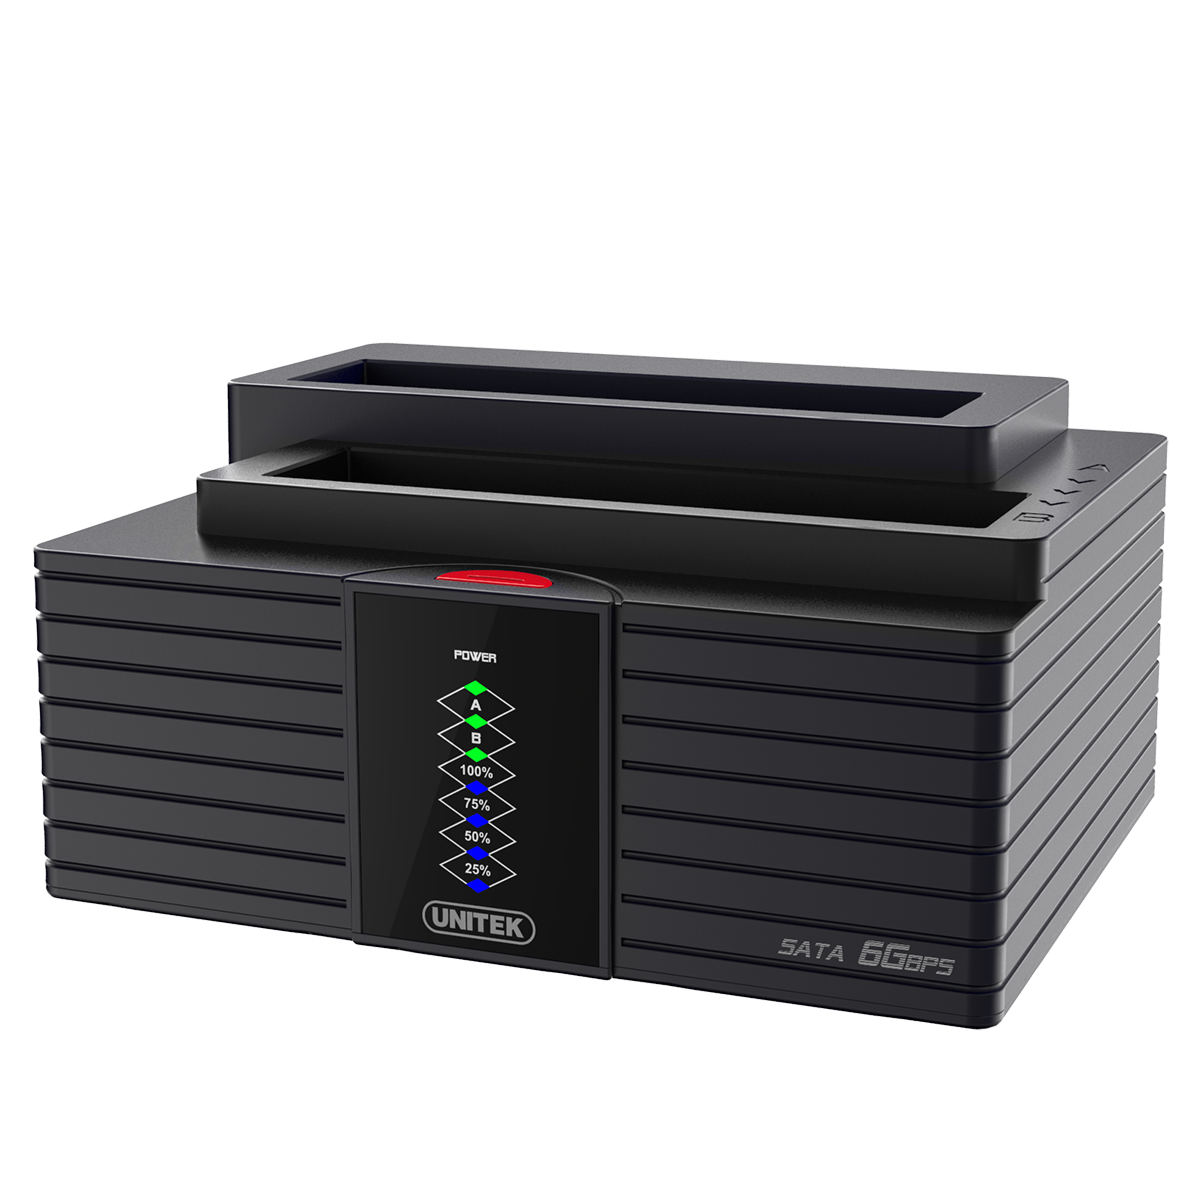 harga Unitek HDD Docking Station Dual SATA 3 [USB 3.0] Blibli.com